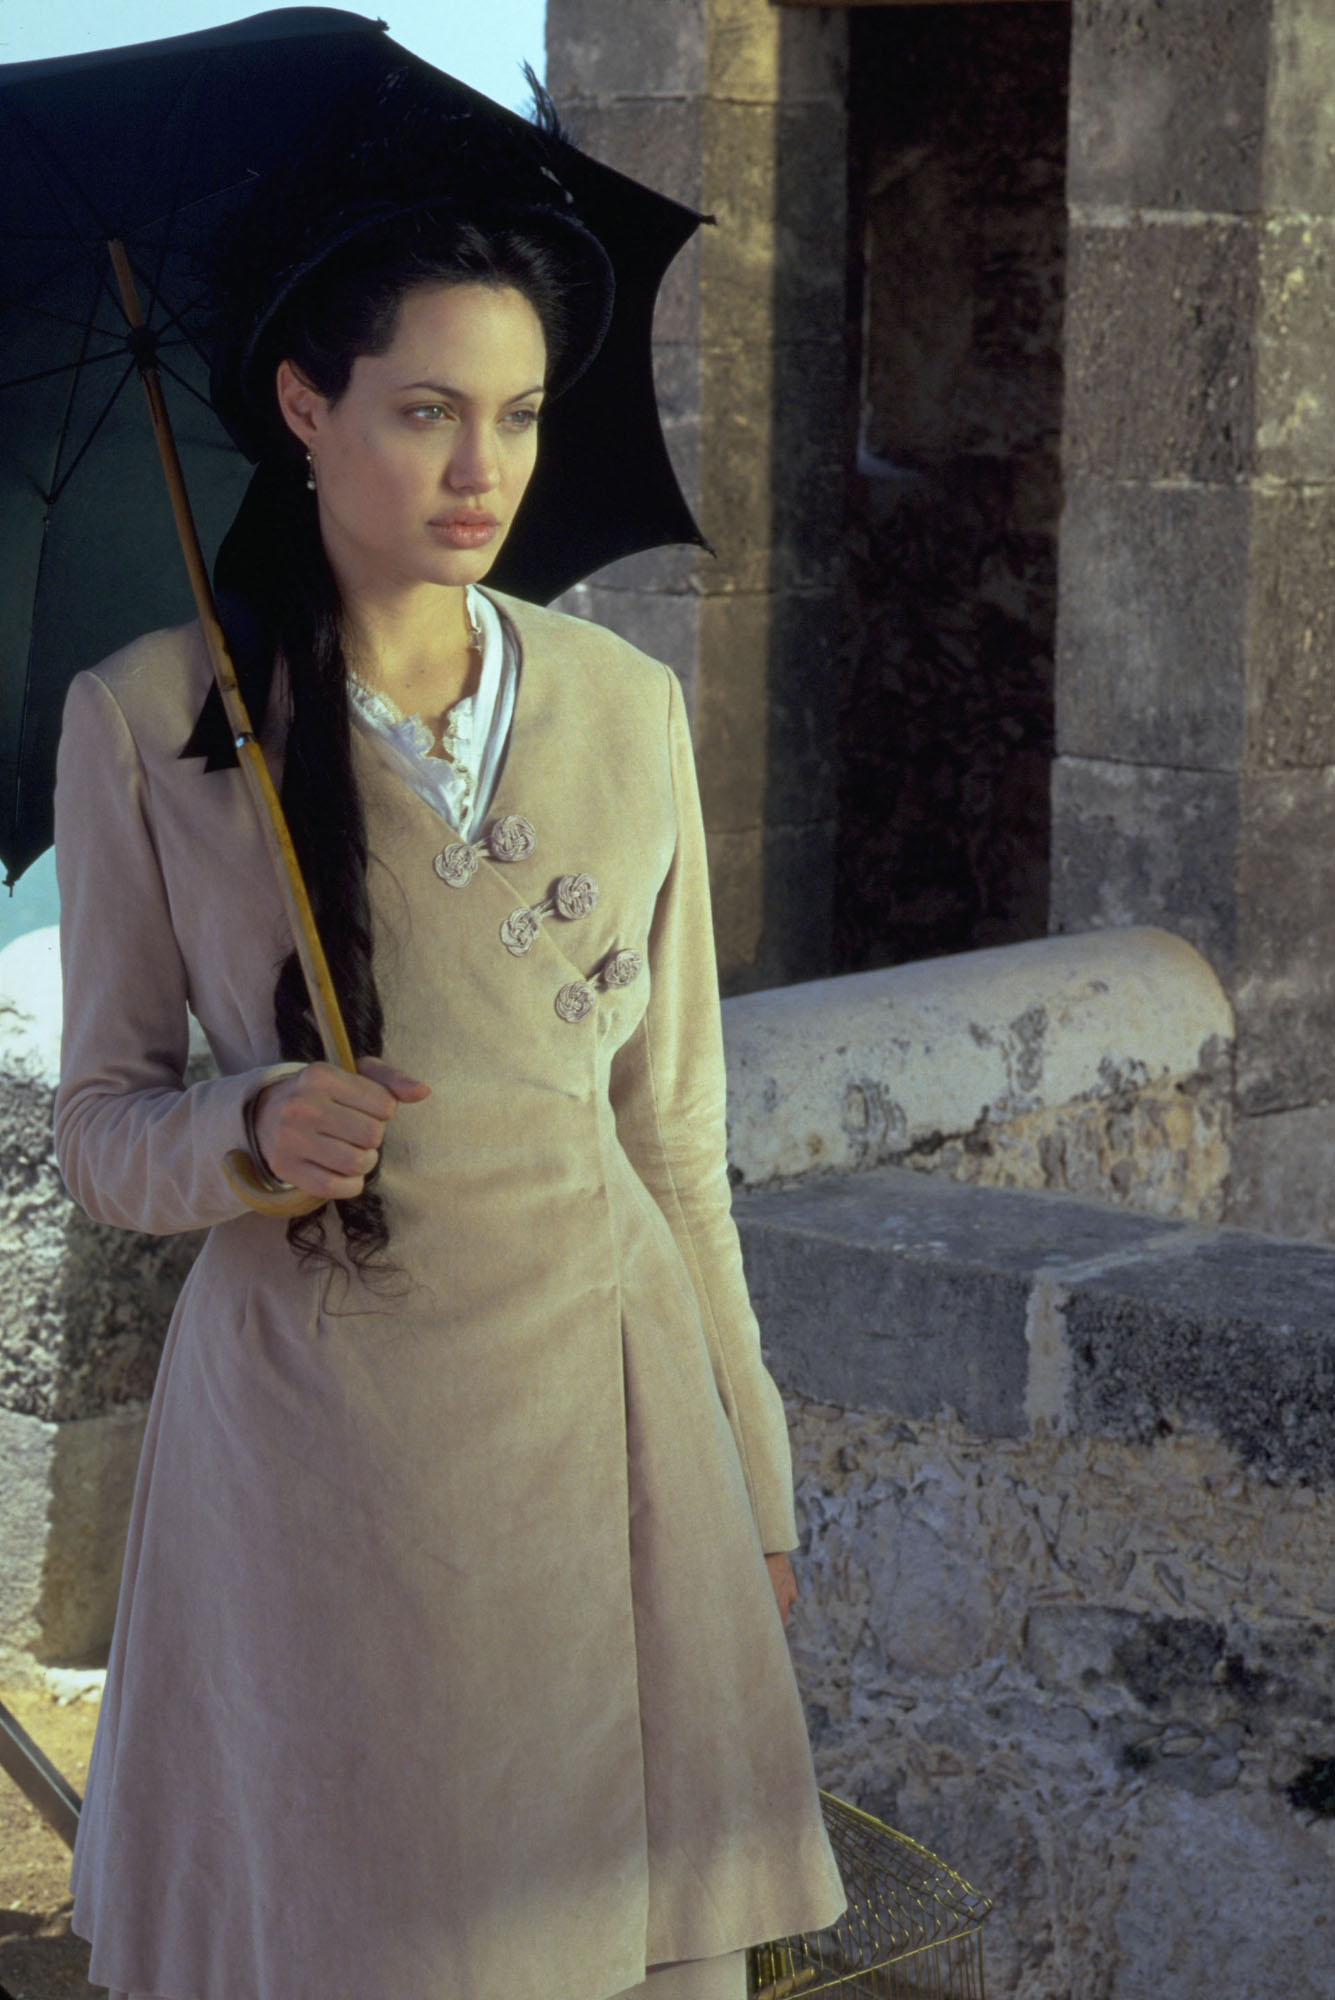 Angelina jolie in lara croft tomb raider the cradle of life 2006 - 2 2